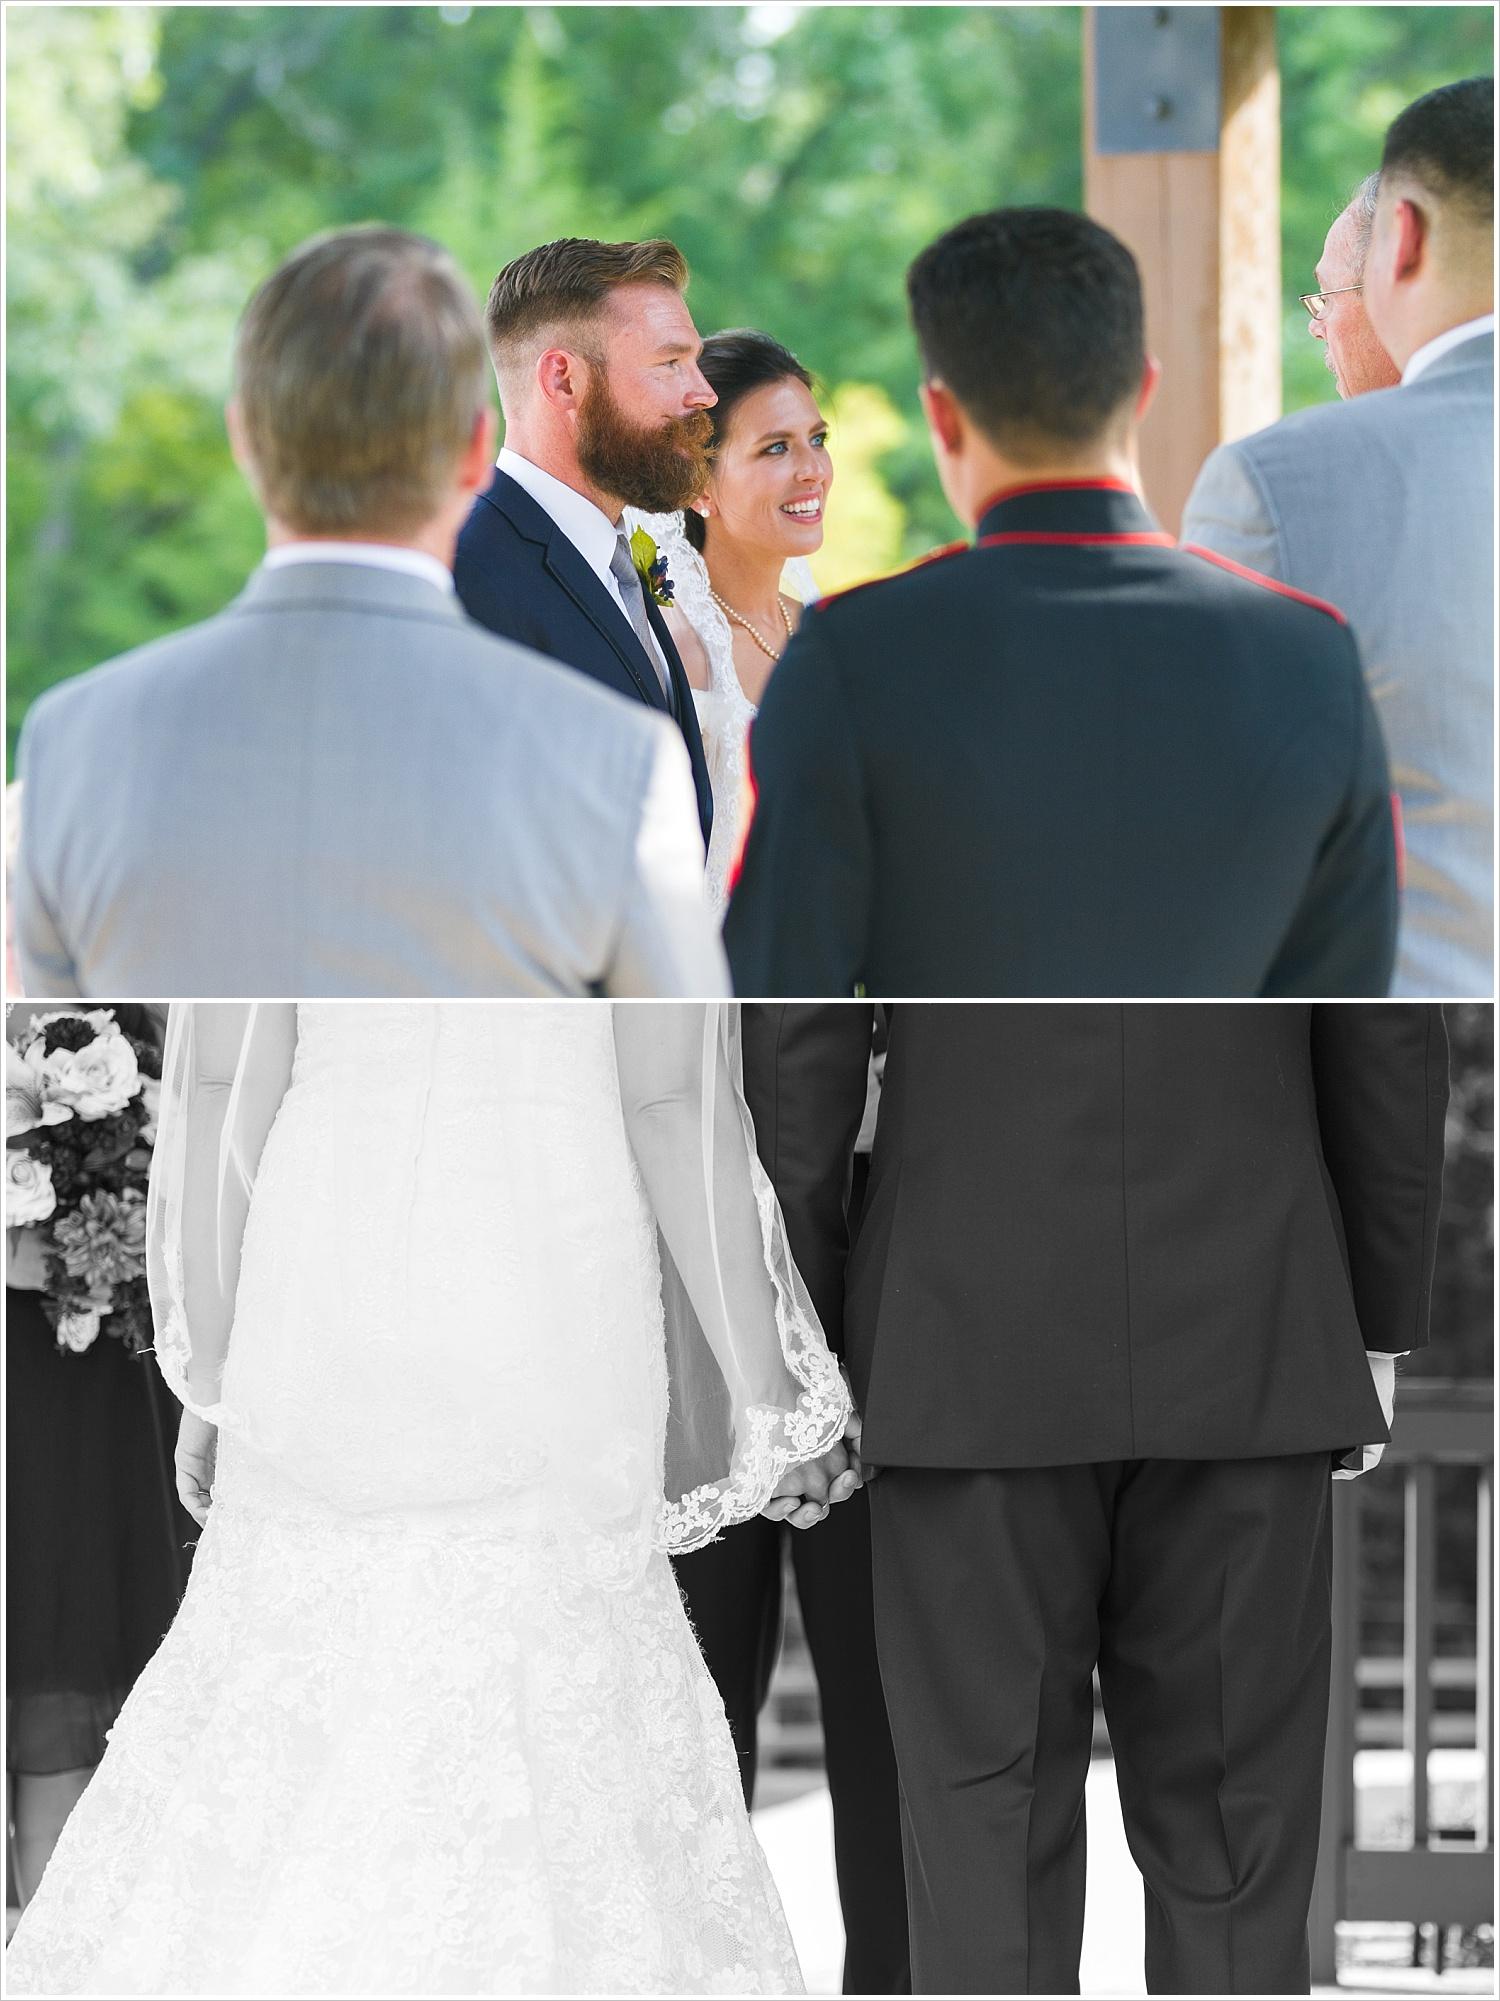 McKinney-Texas-Wedding-The-Springs-Jason&Melaina-Photography_0033.jpg